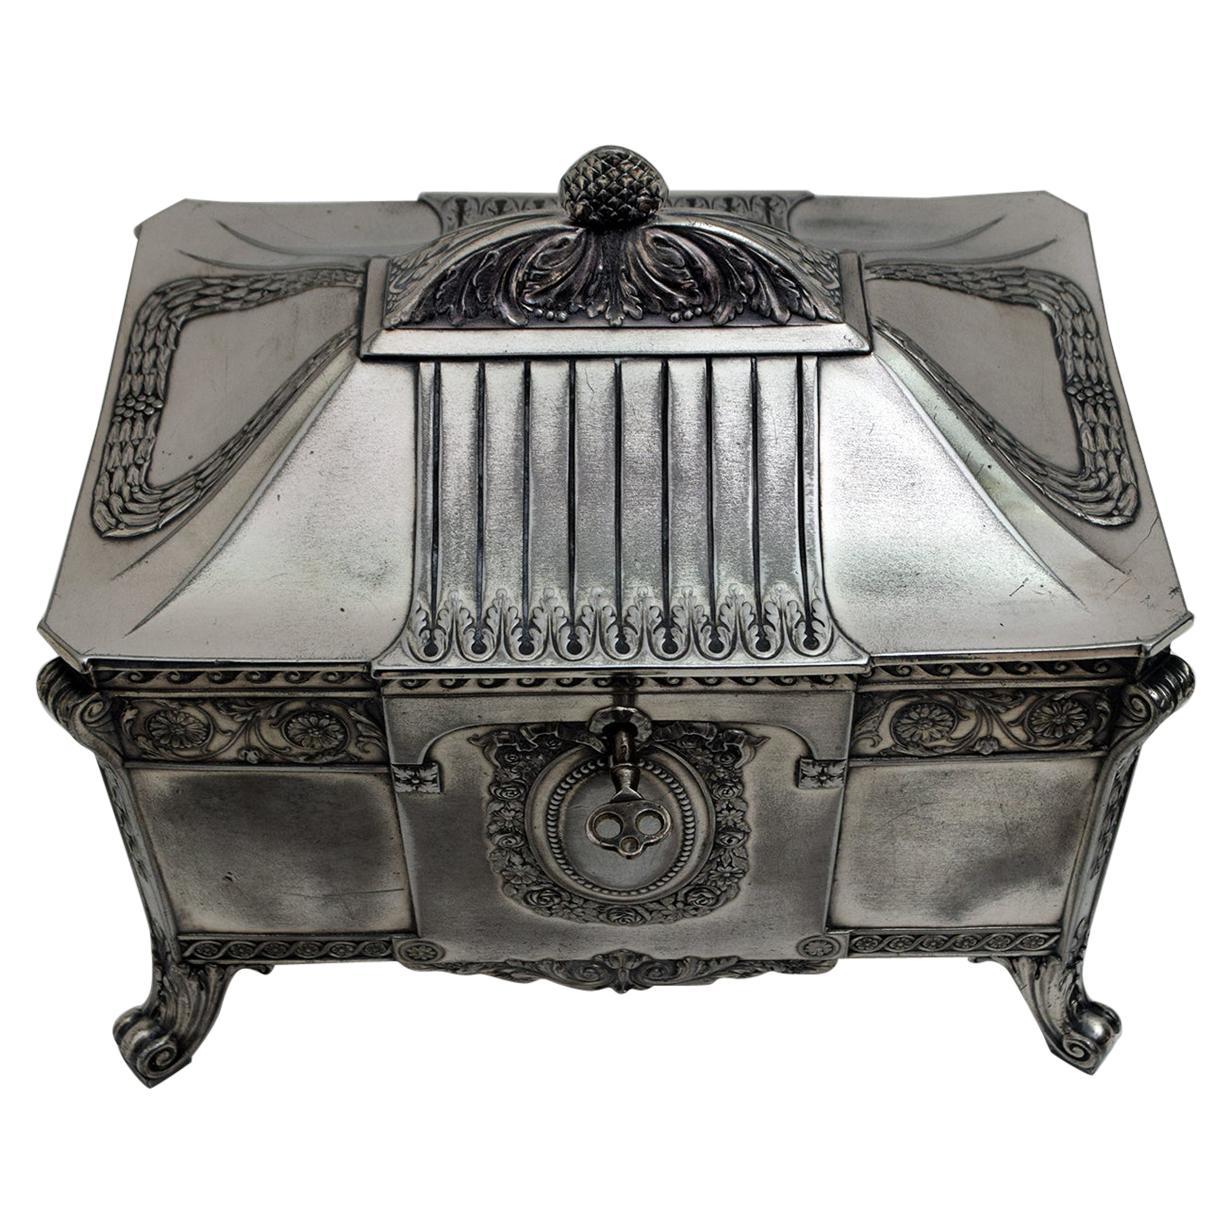 WMF Art Nouveau Germany Silver Plate Jewelery Box, 1900s